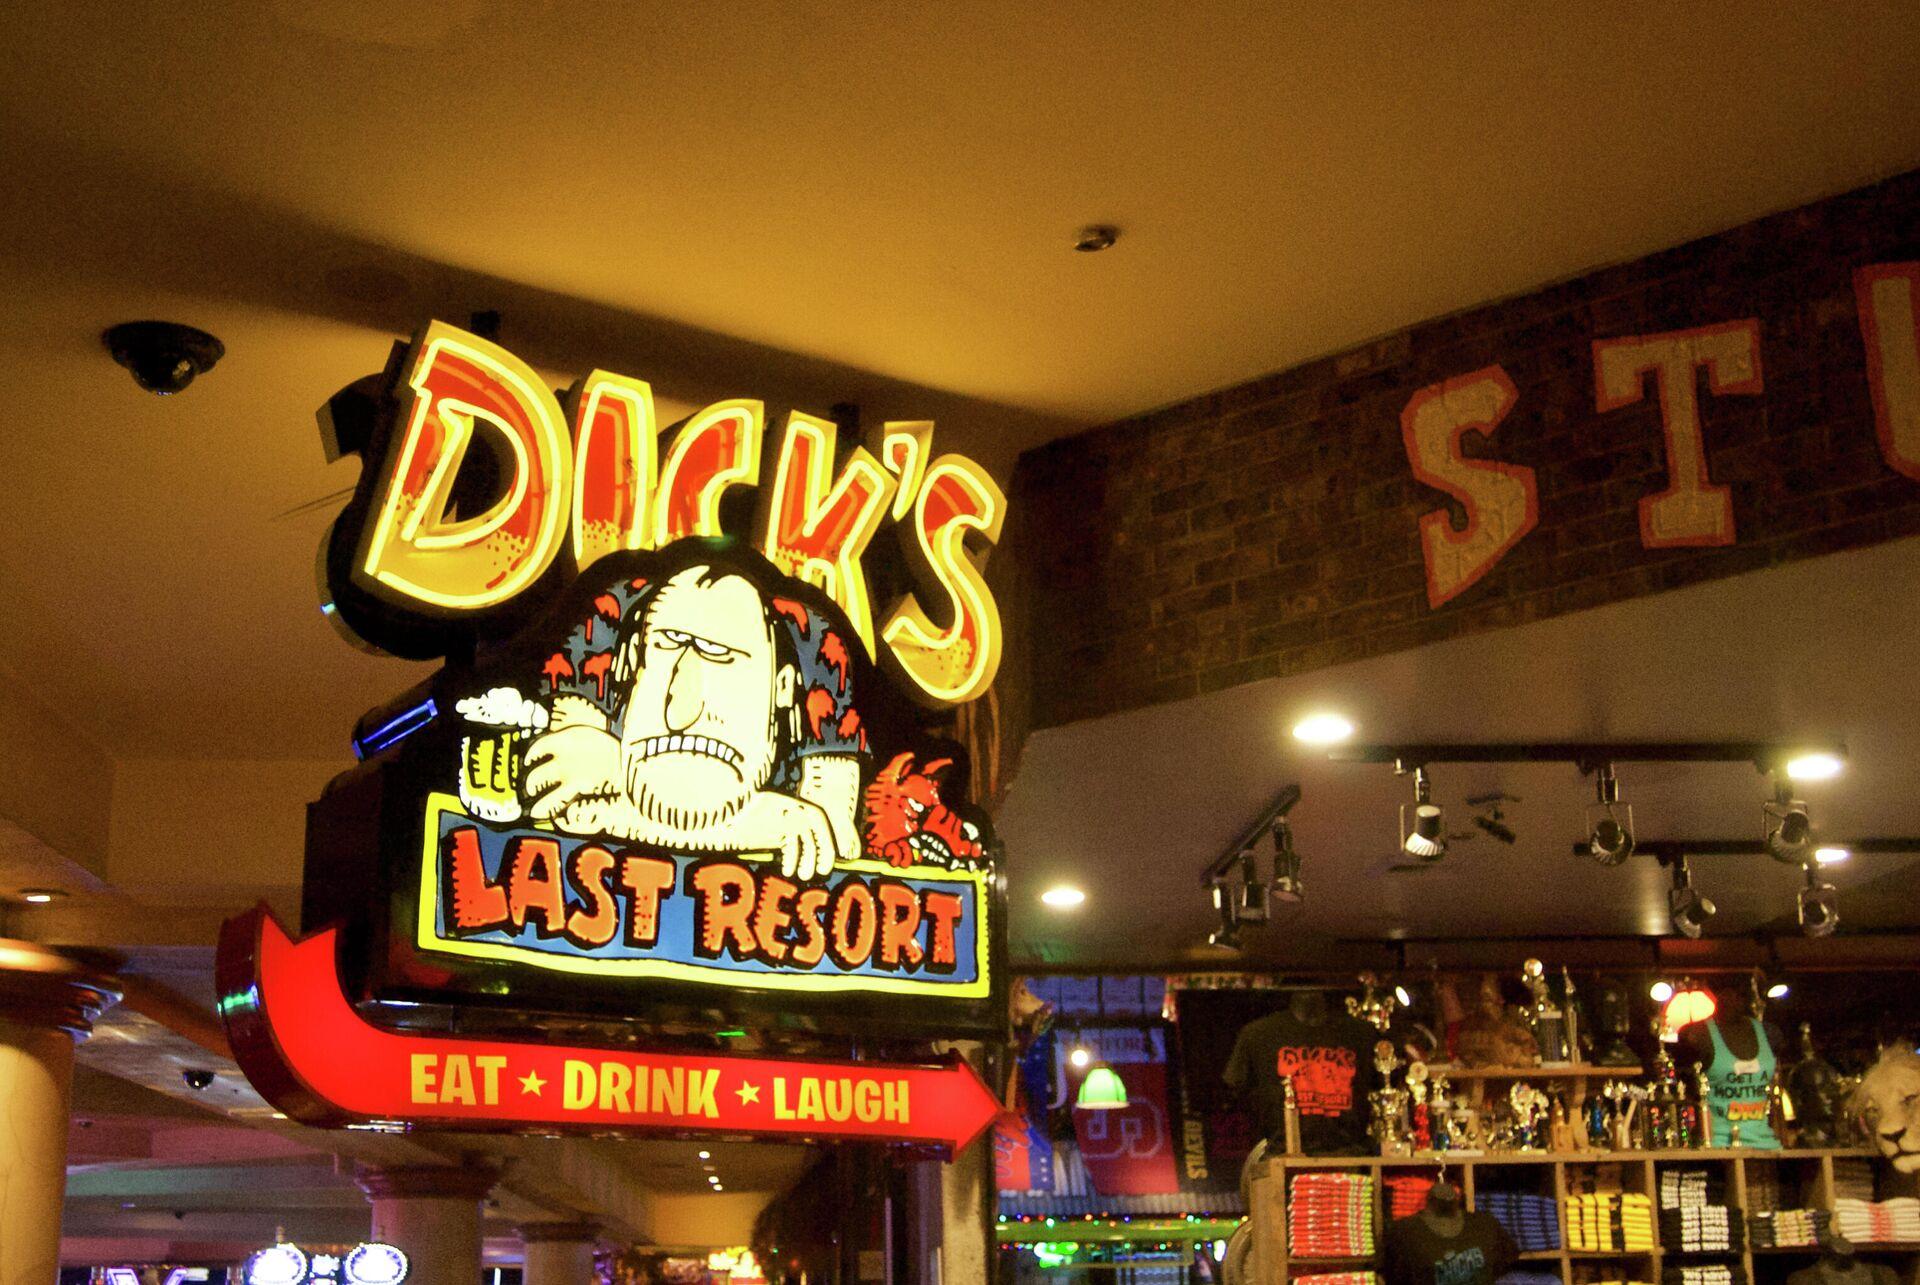 Ресторан Dick's Last Resort в США - РИА Новости, 1920, 16.12.2020